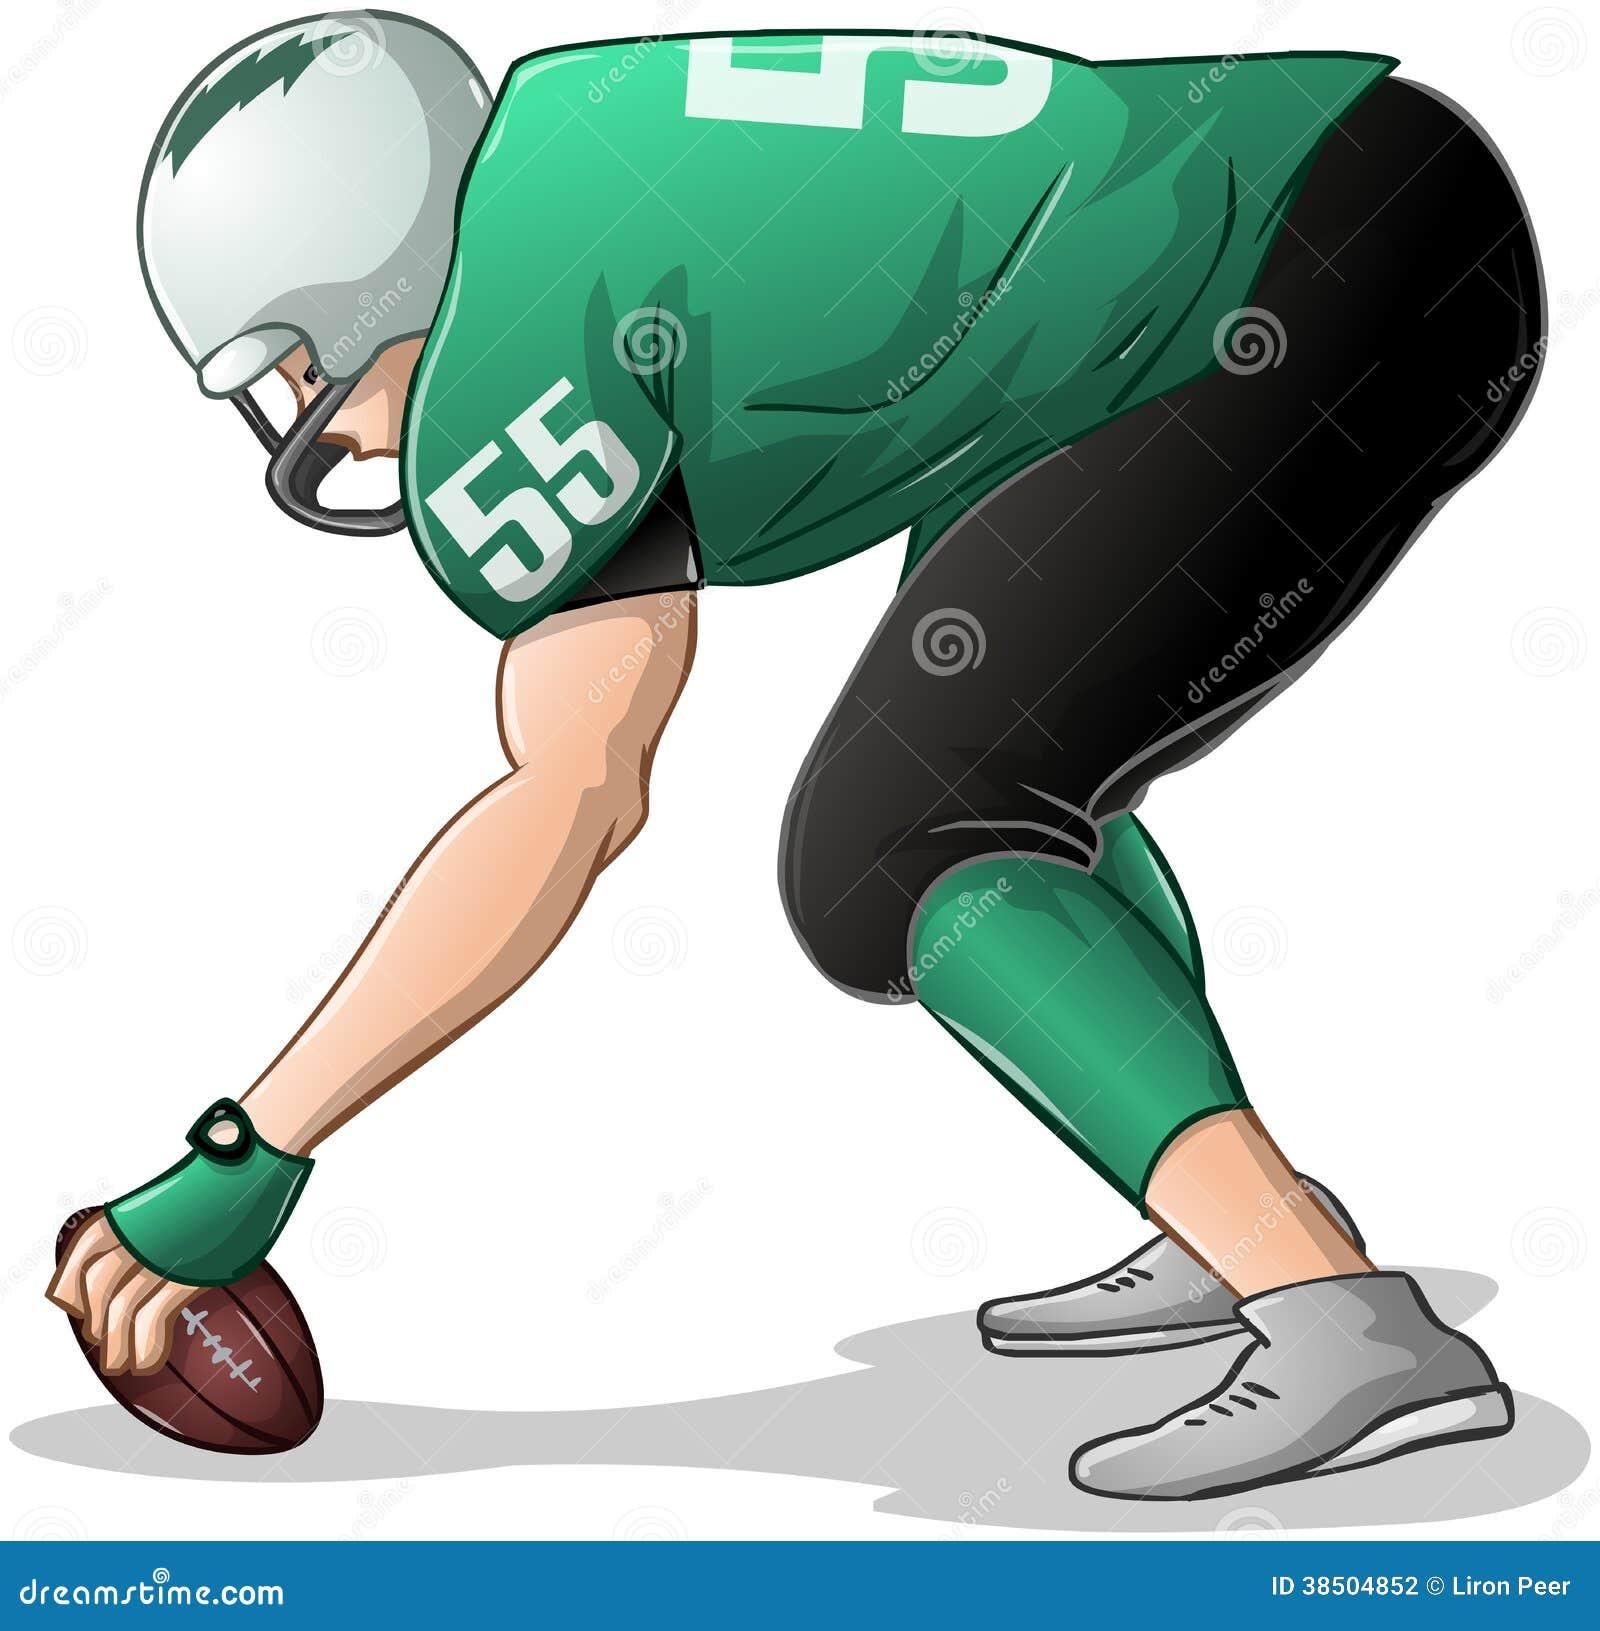 Football Cartoon Stock Images RoyaltyFree Images